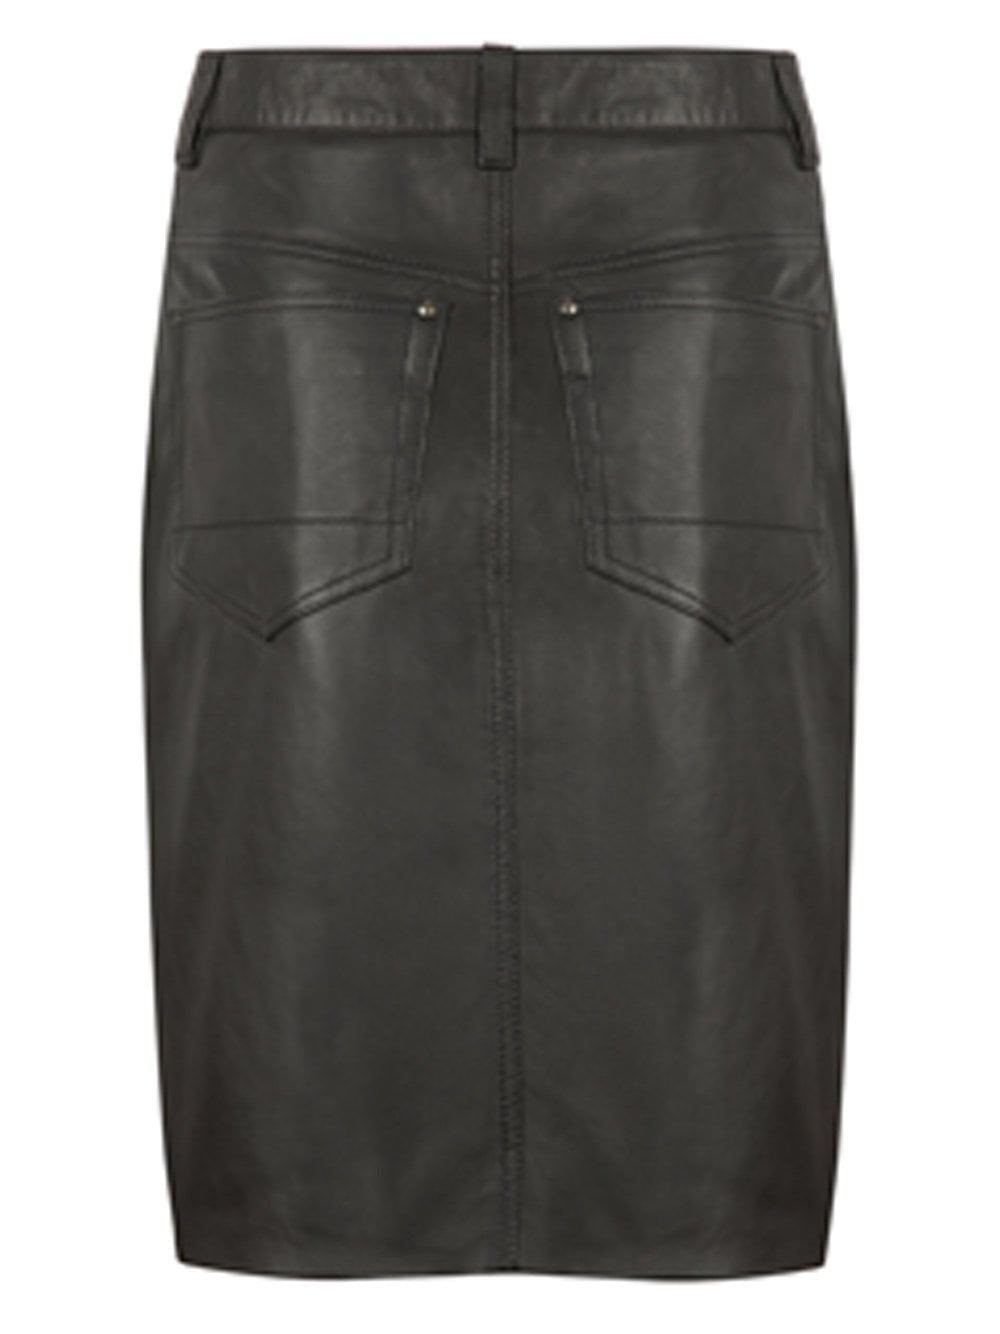 lambeth black leather denim pencil skirt muubaa from